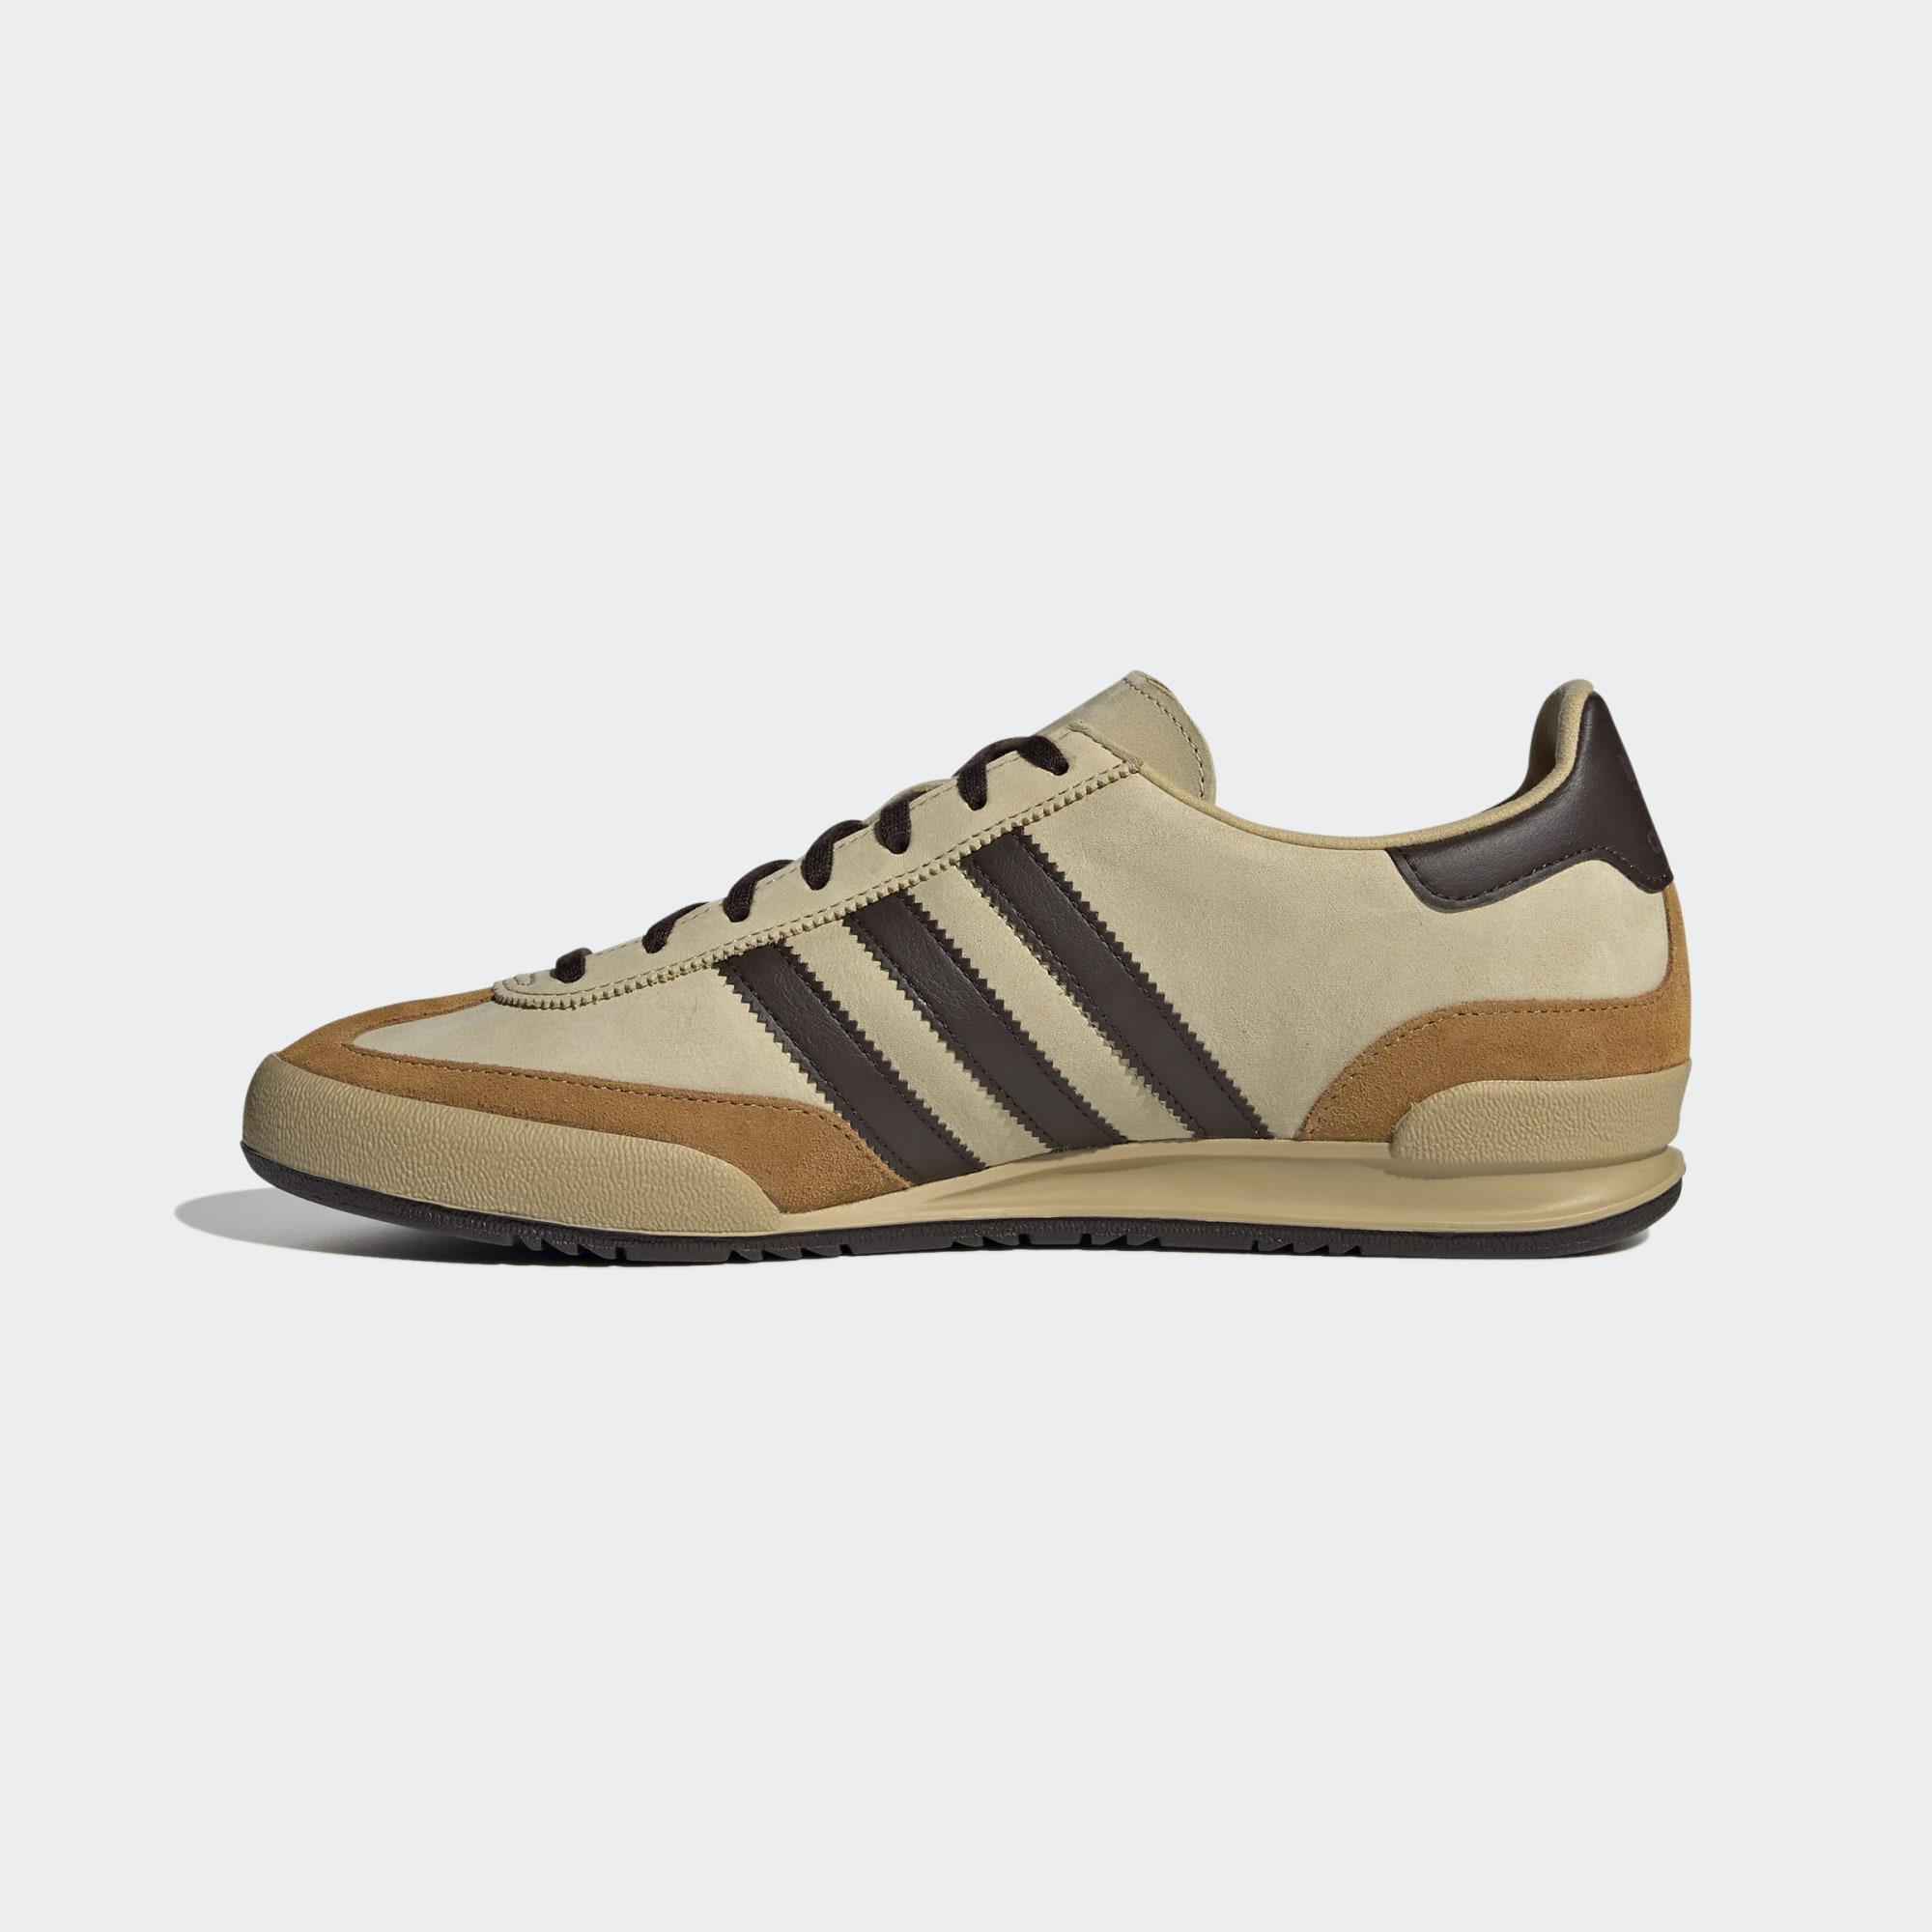 Cord_Shoes_Gul_FX5640_06_standard.jpg